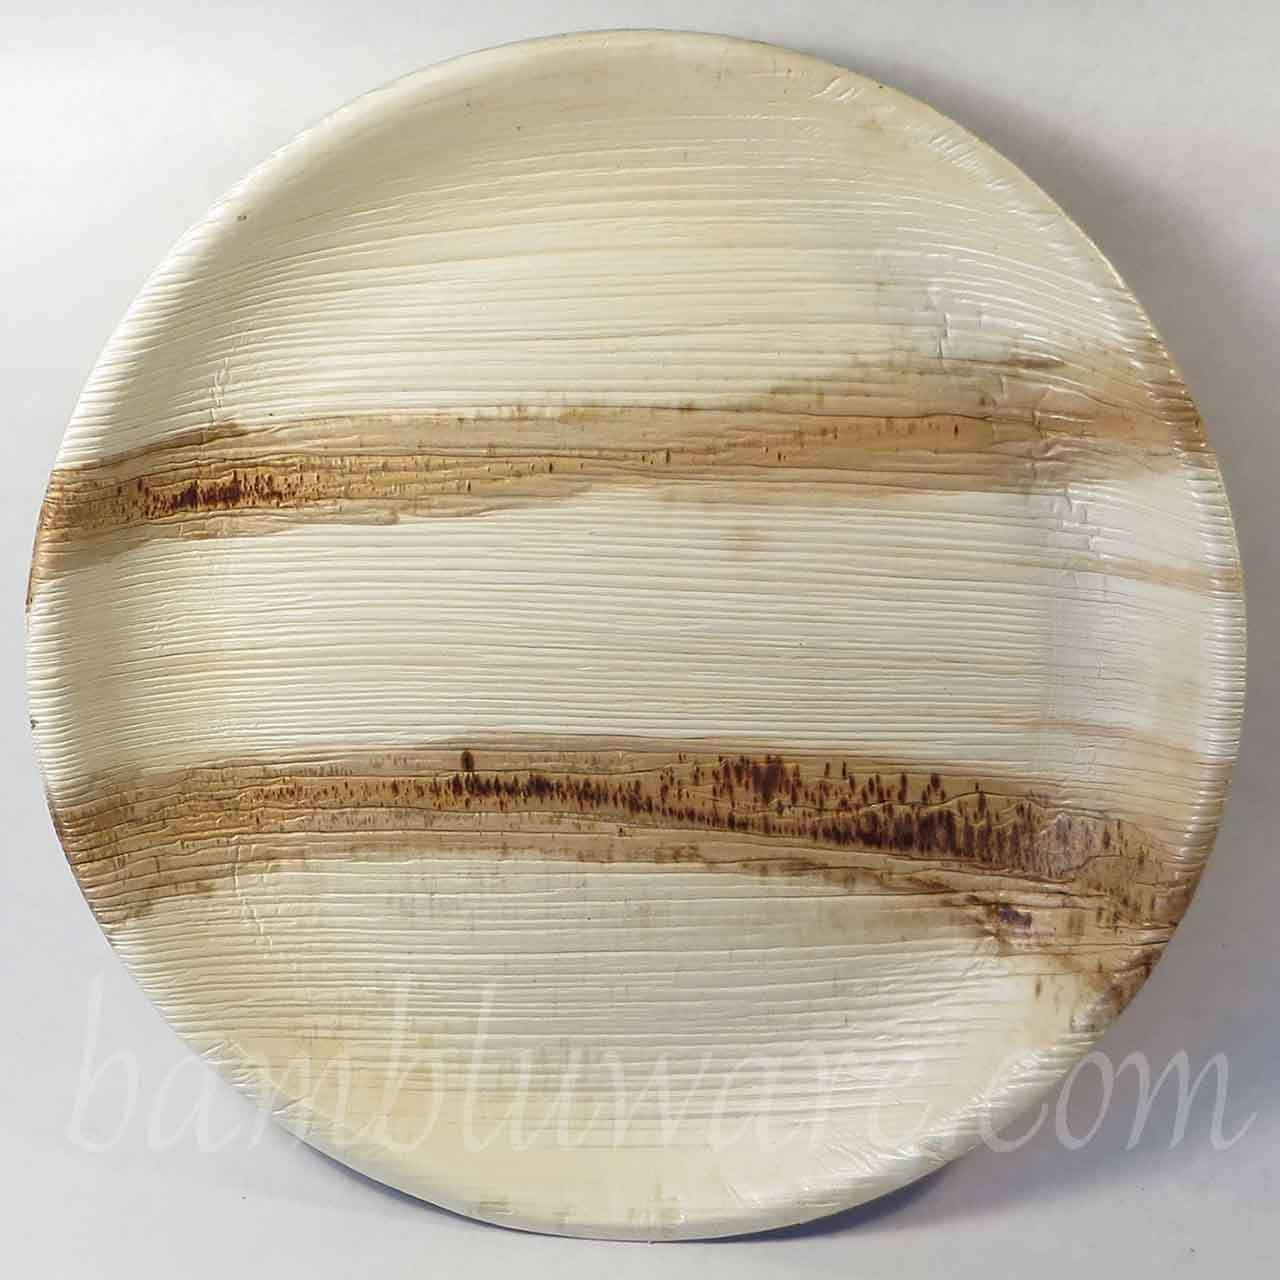 Arthware Palm Leaf Plate 10 Inch Round 100 Cs Palm Leaf Plates Leaf Plates Tableware Design